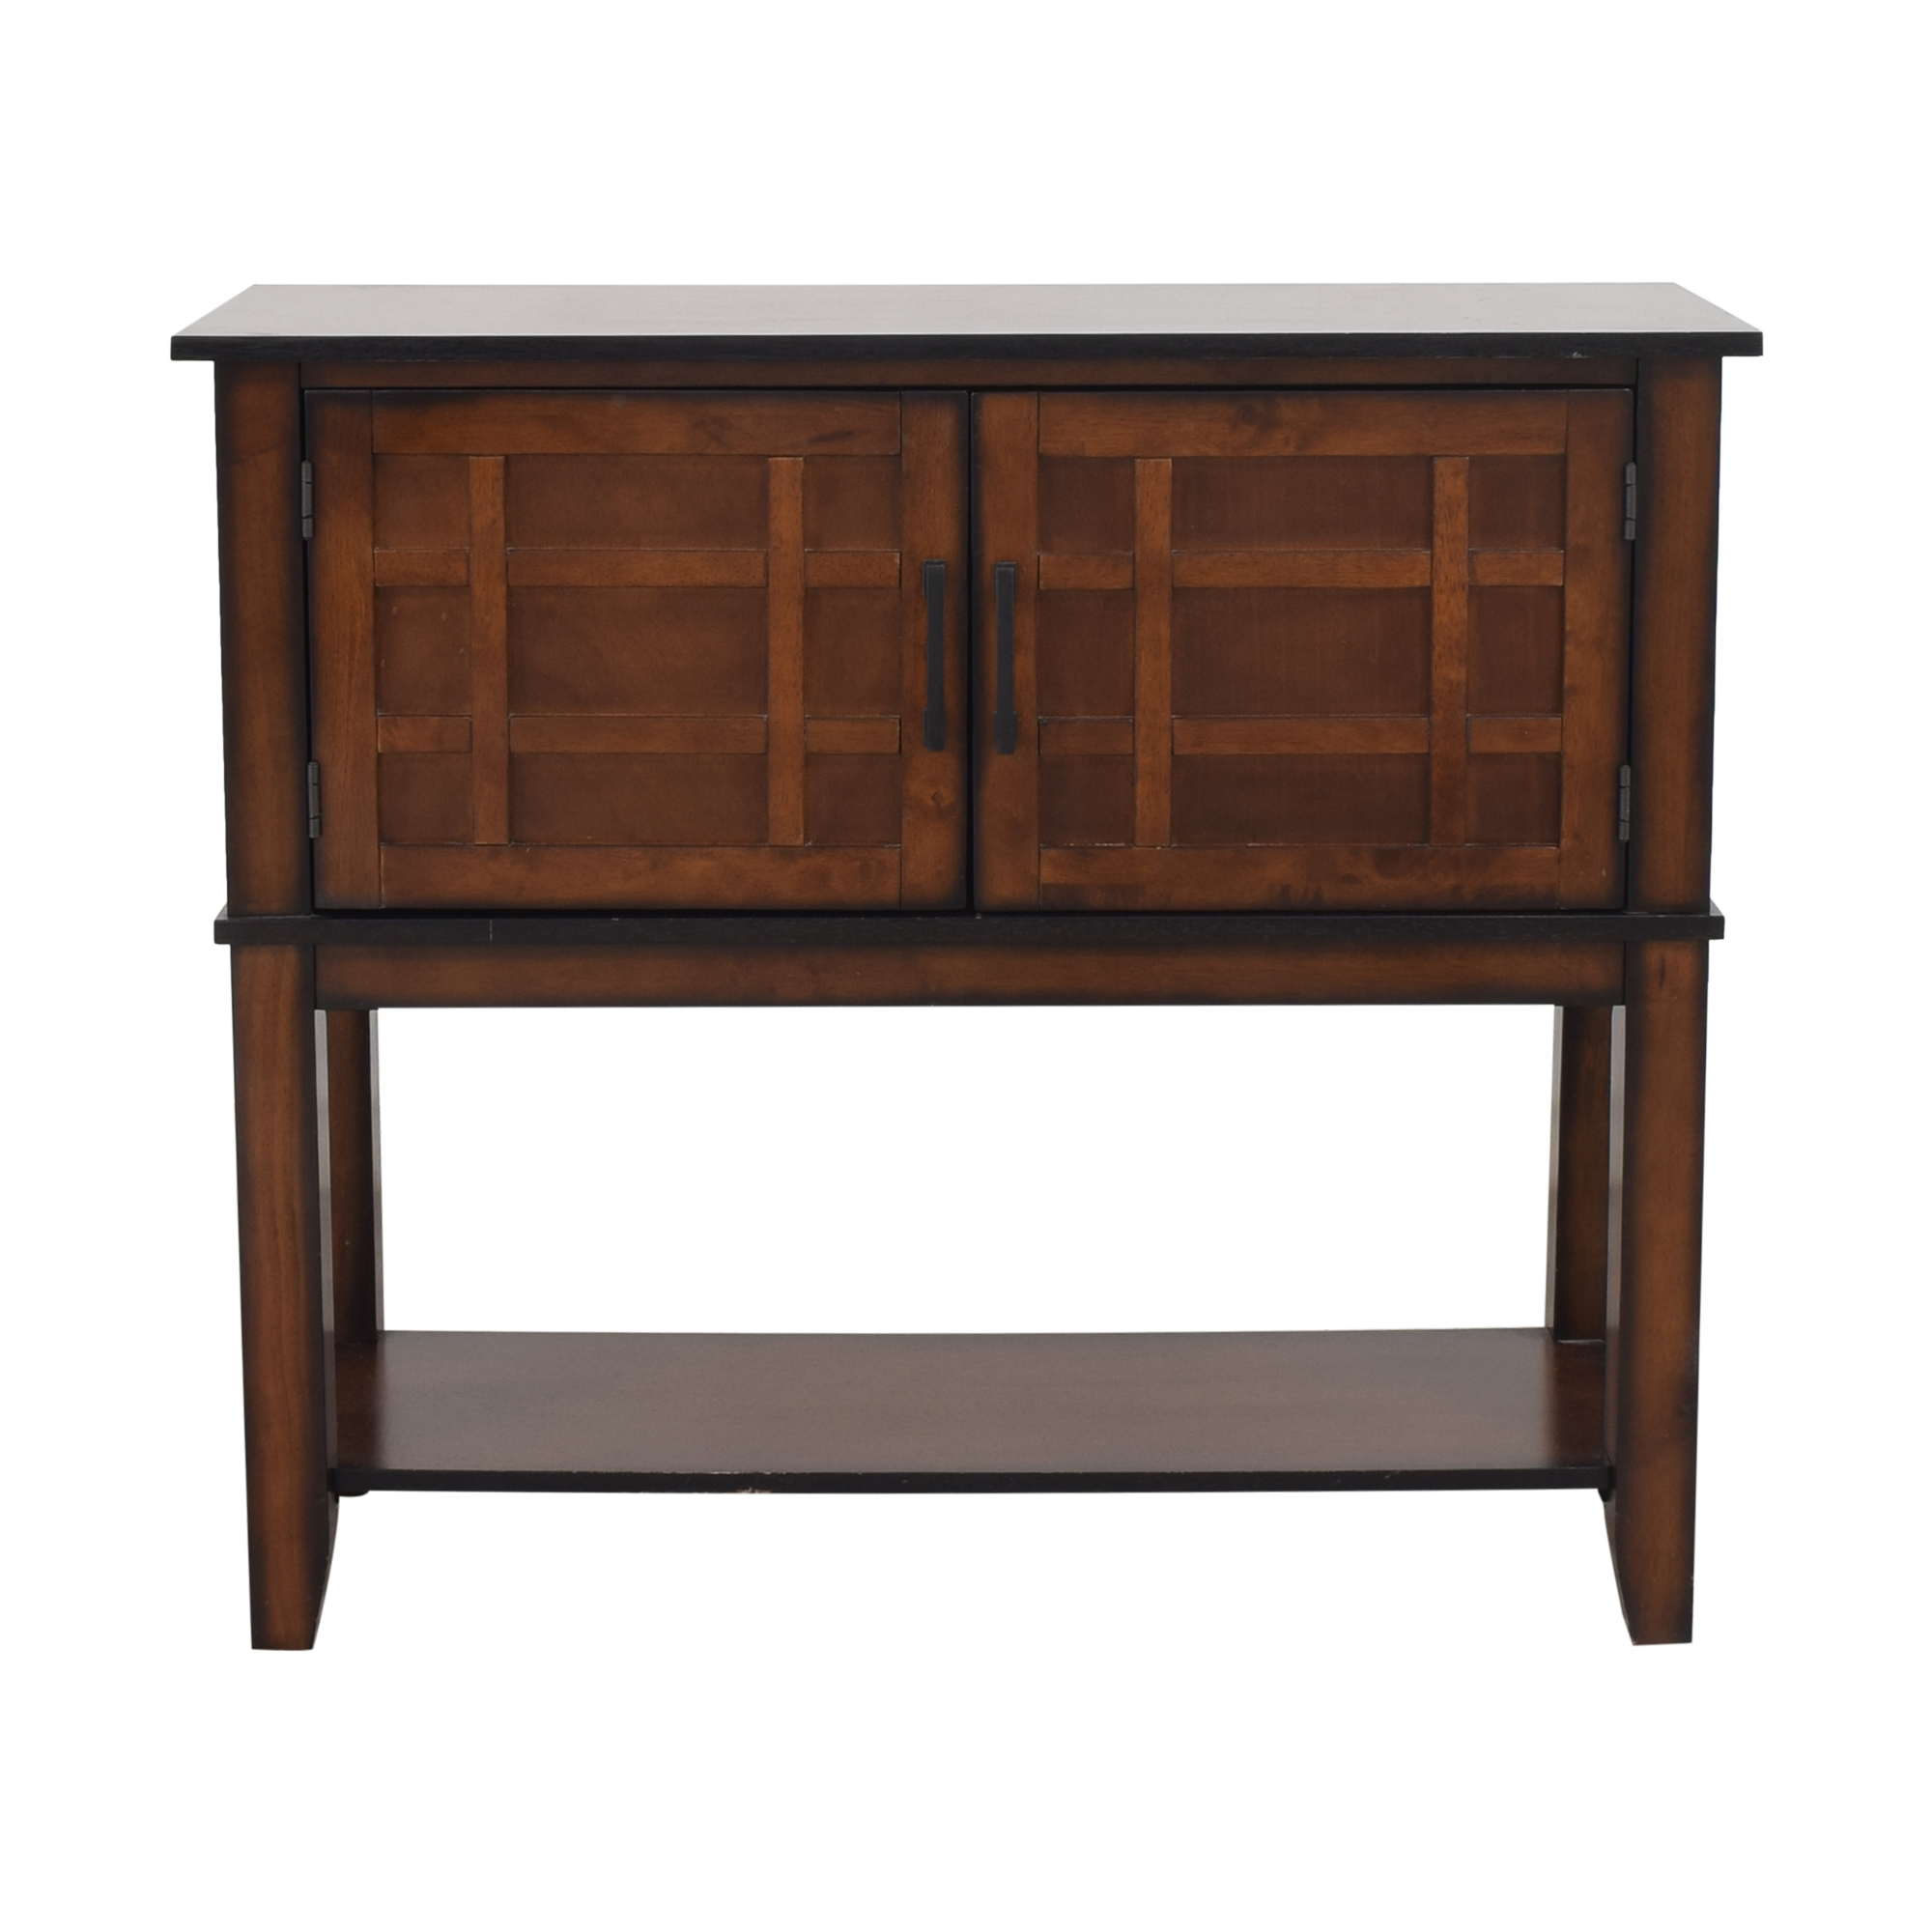 Standard Furniture Standard Furniture Sideboard ct